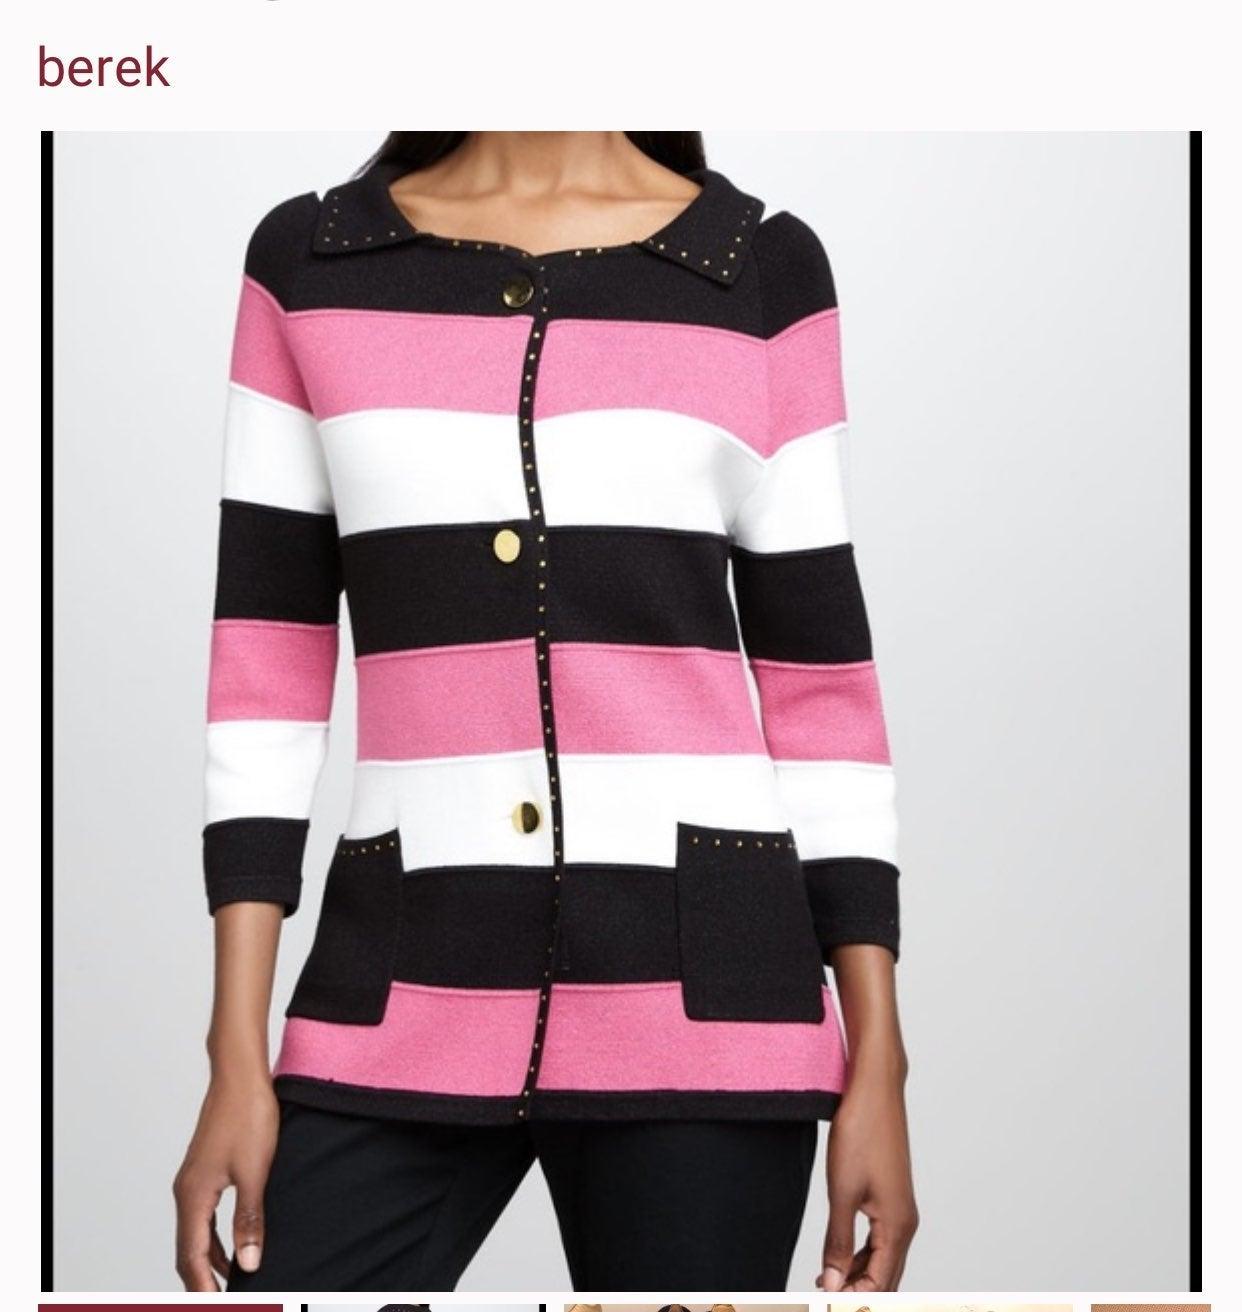 Berek Striped Sweater Cardigan Jacket PL